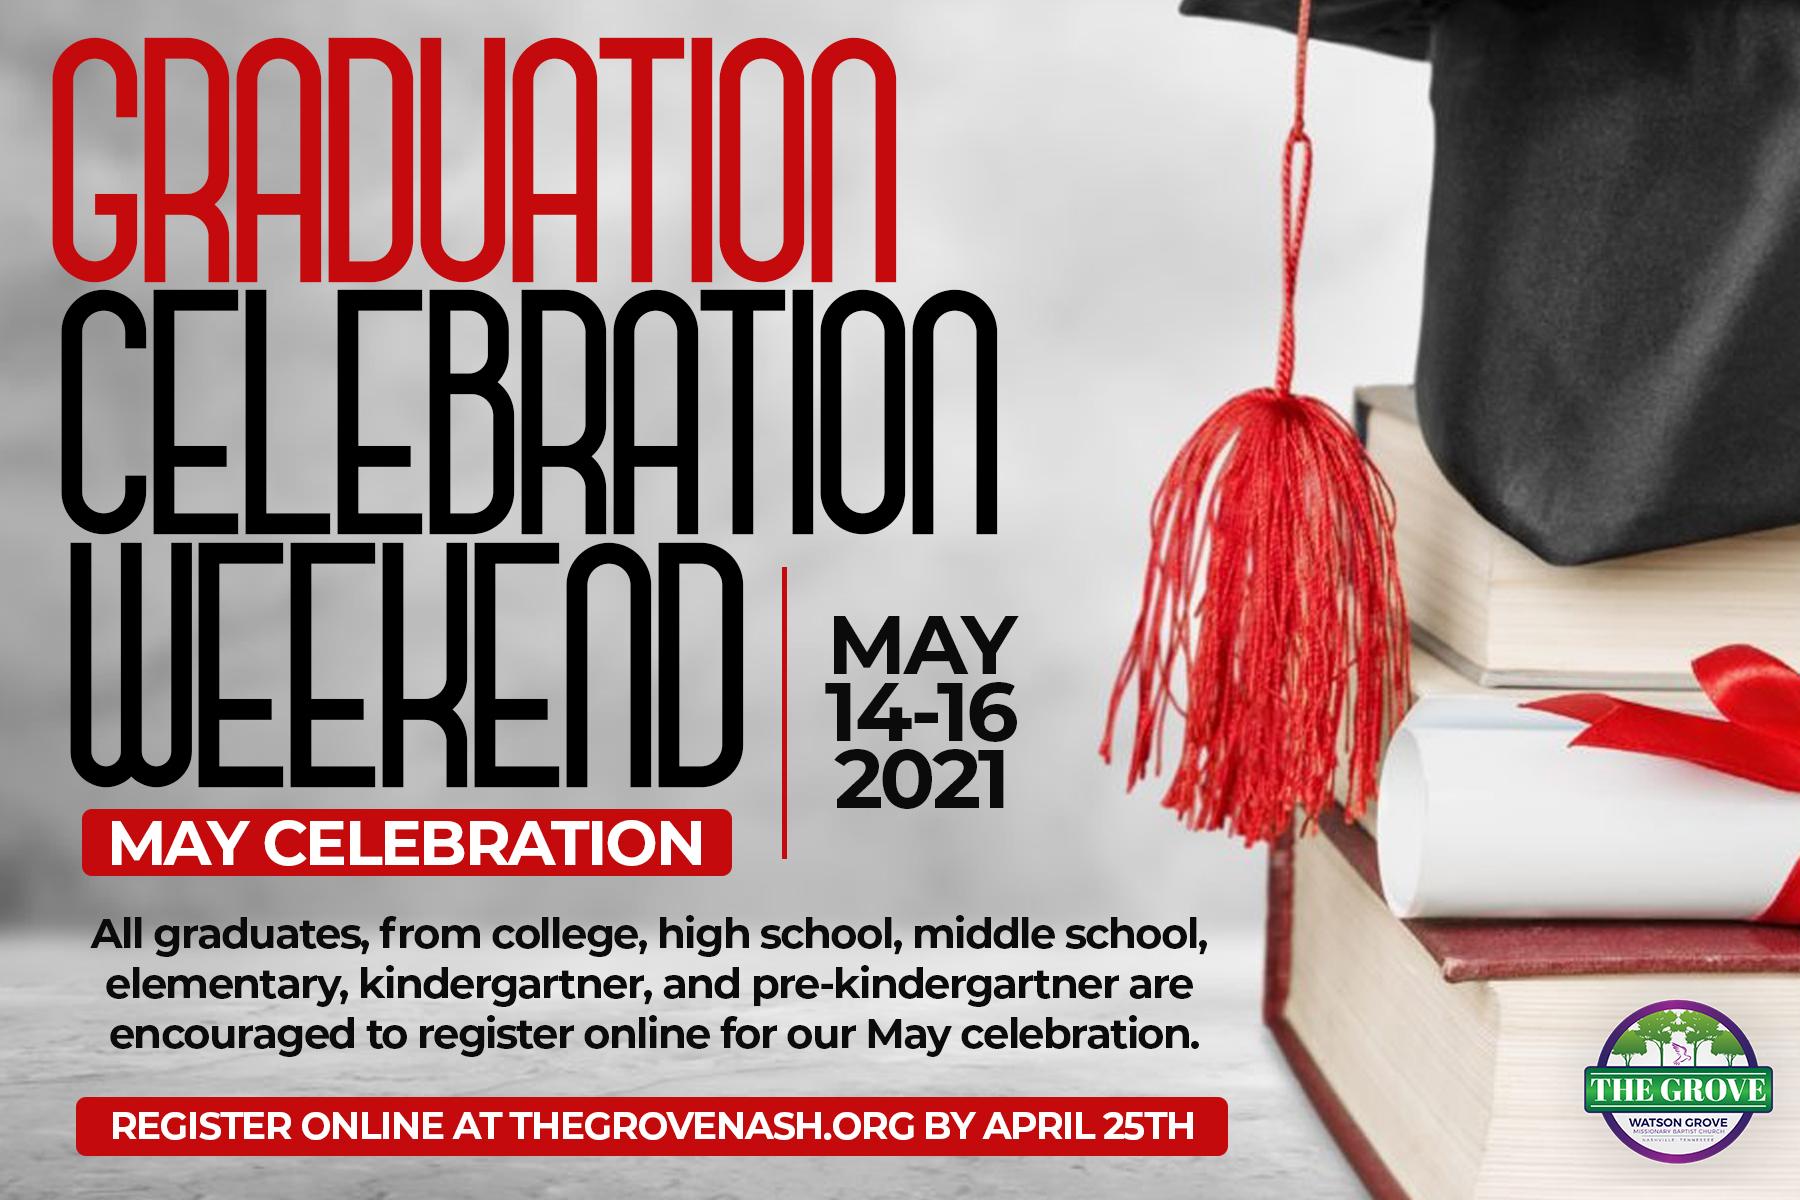 GraduationCelebration2021